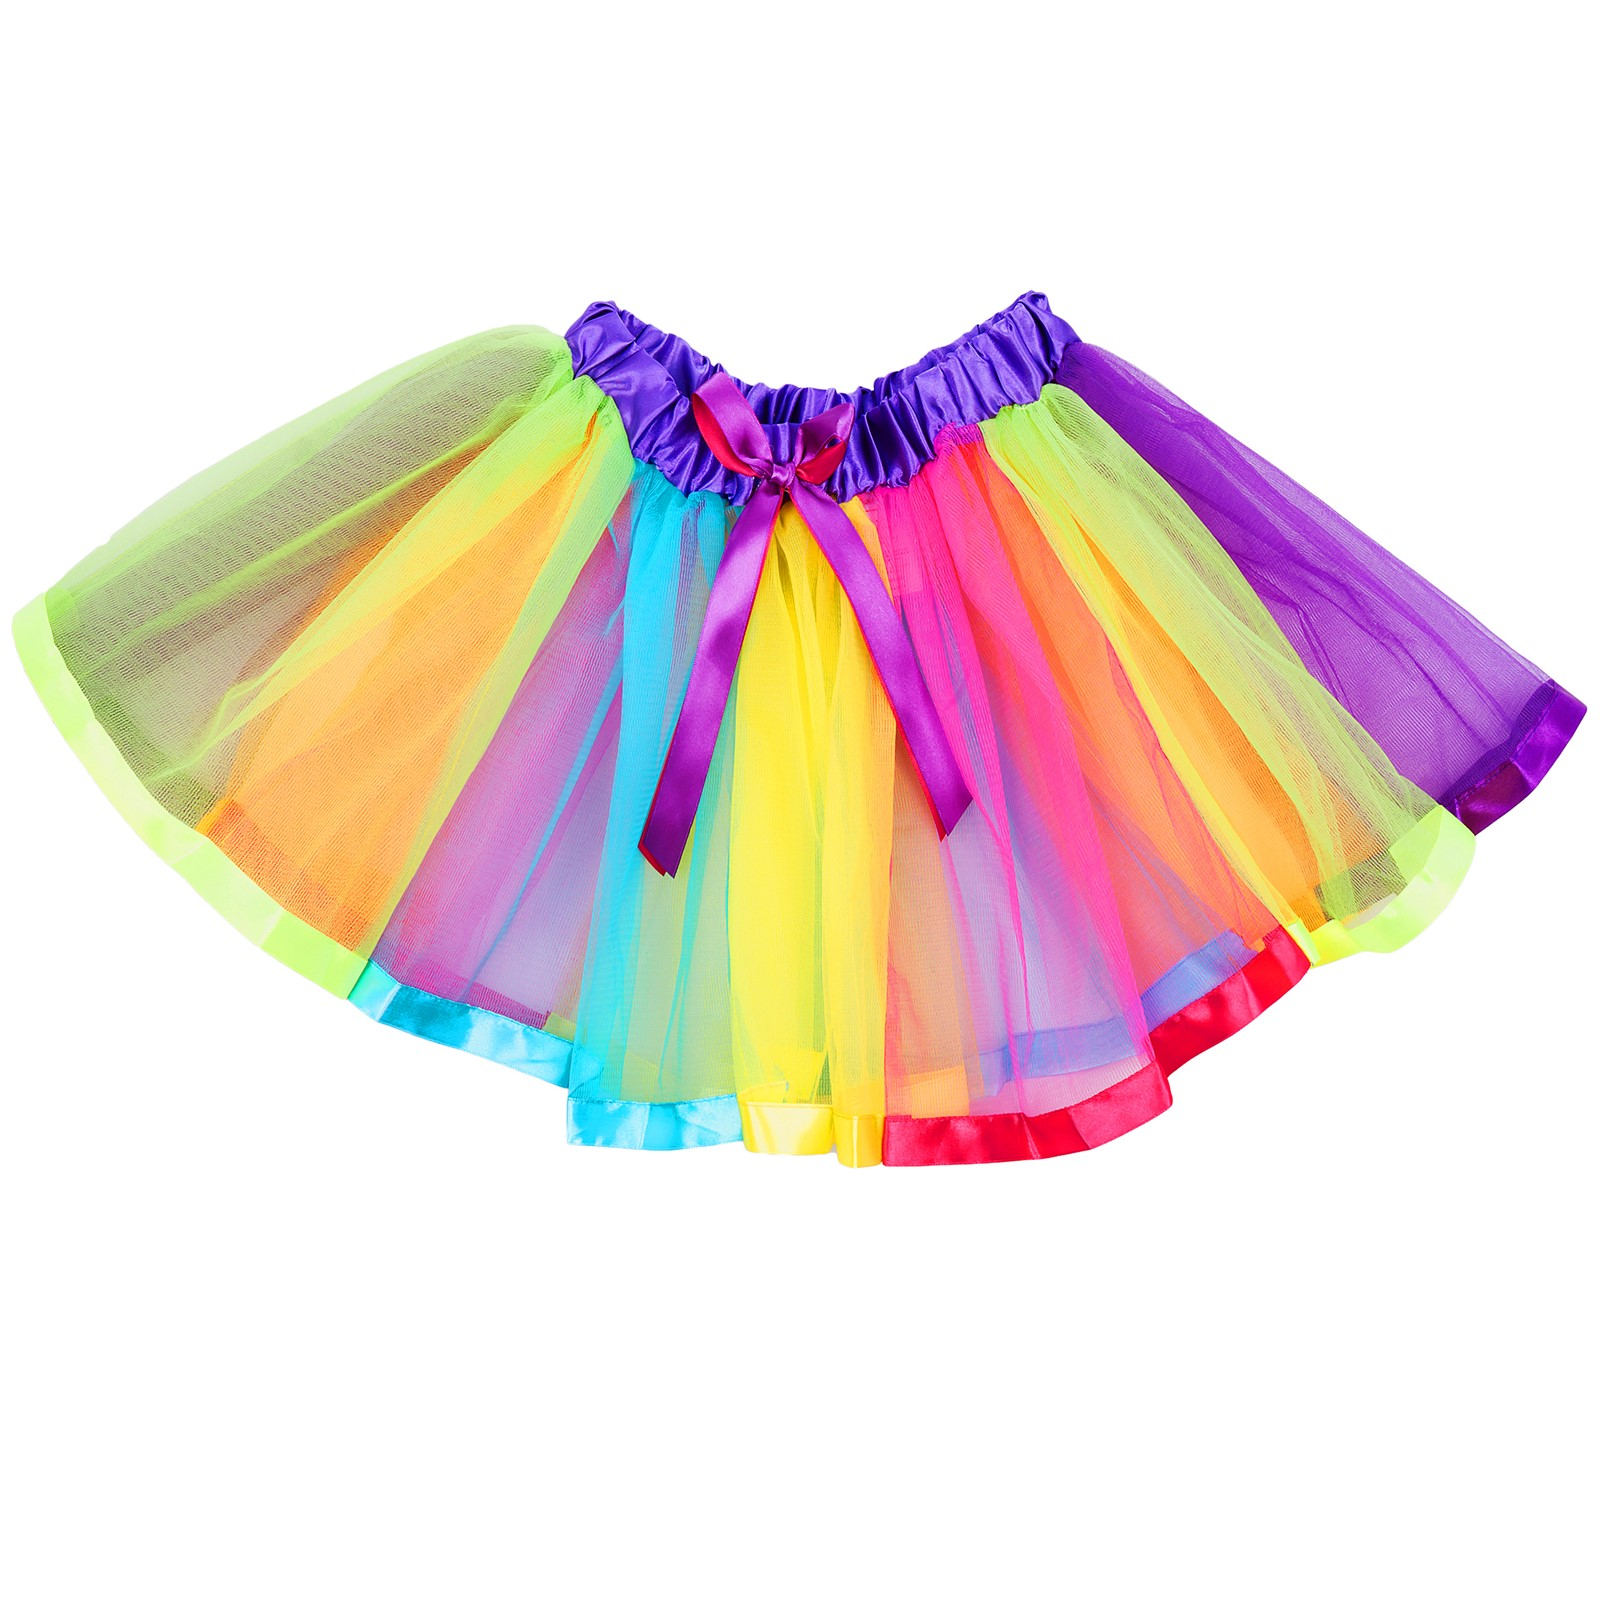 GIRLS RAINBOW TUTU SKIRT MULTICOLOURED PETTICOAT KID/'S COSTUME BALLET DANCE UK